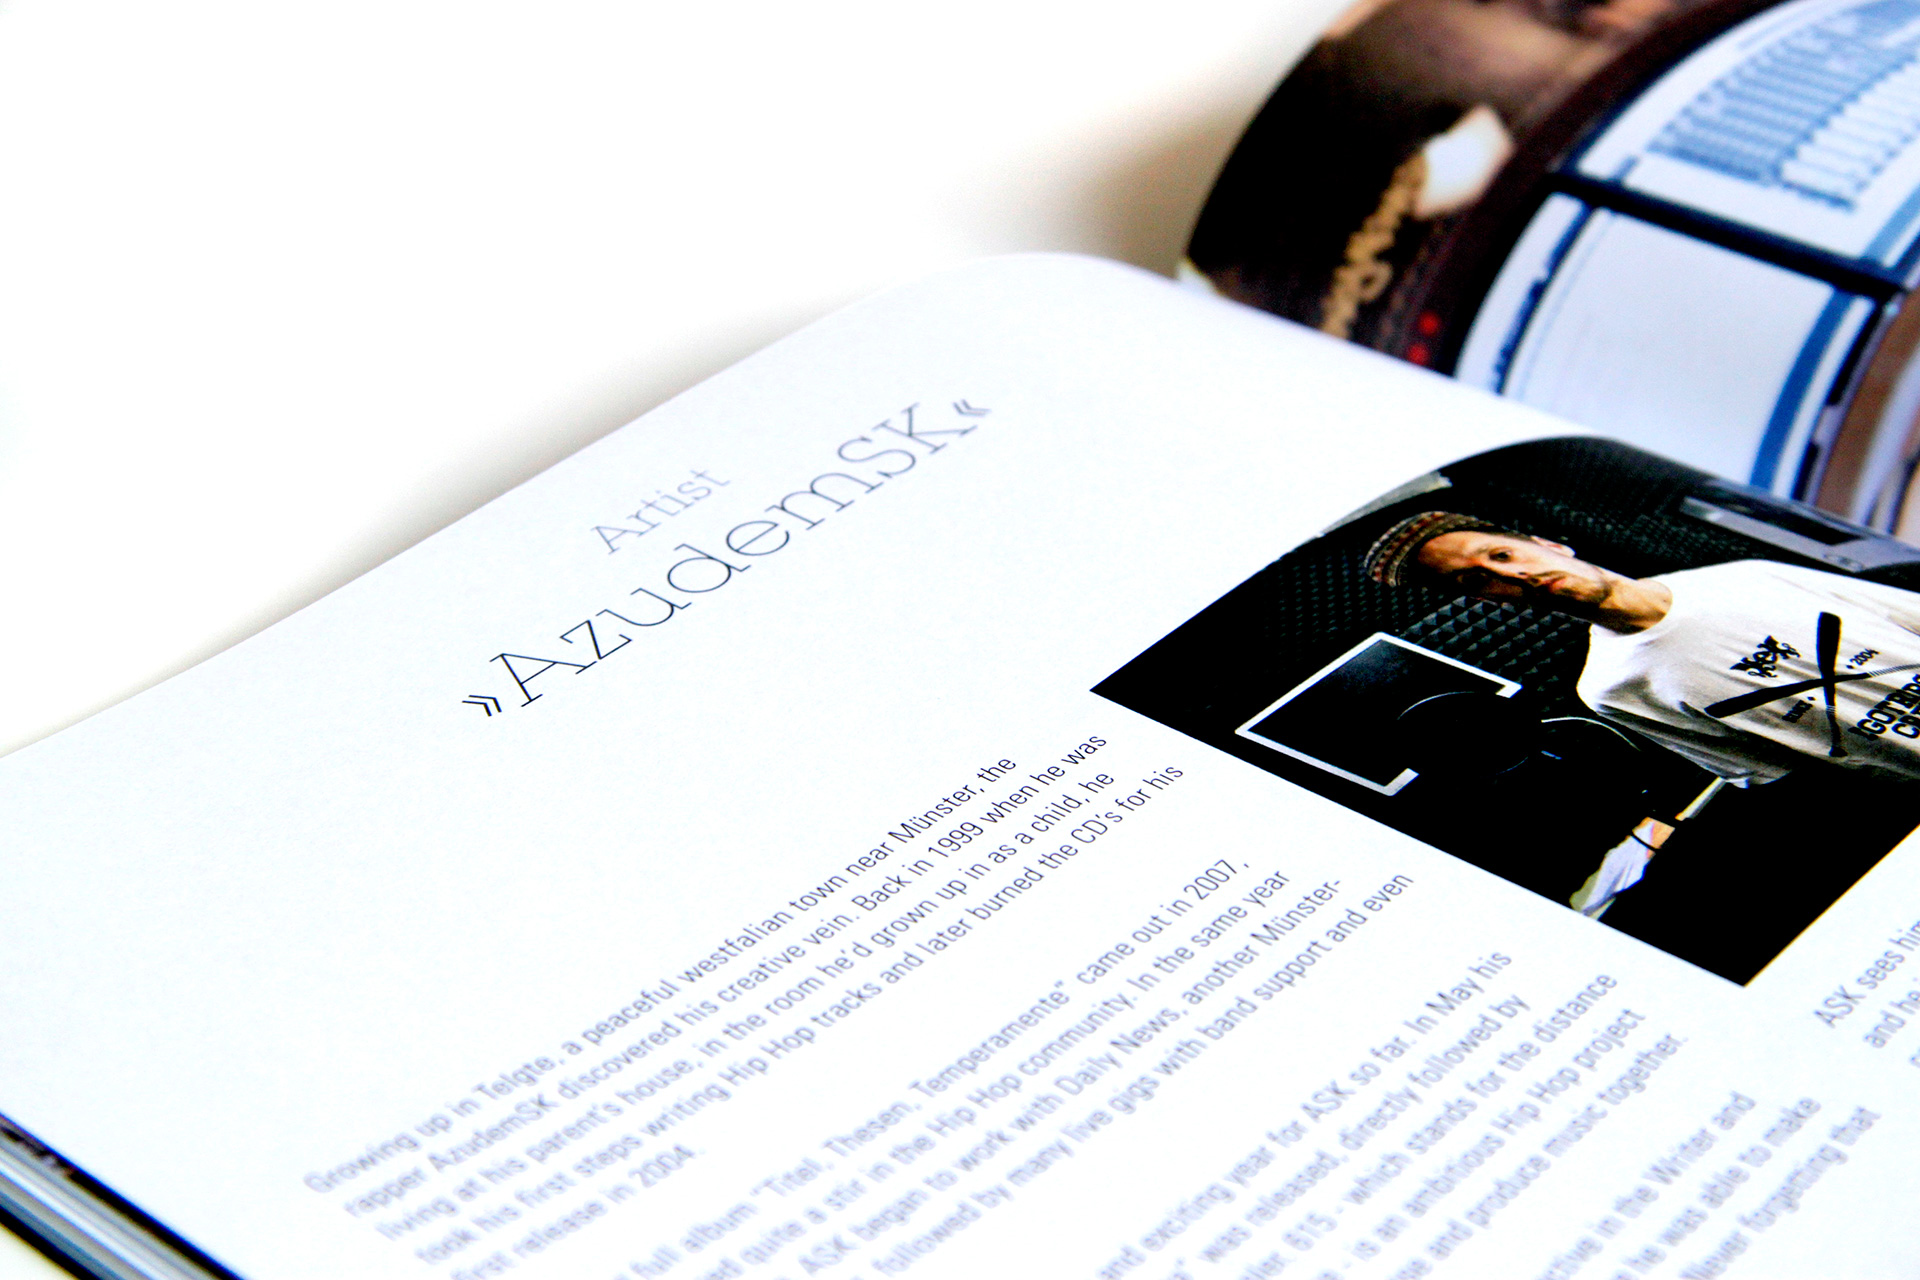 Lookbook, Design, Egotrips, Kollektion, Katalog, Druck, Buch, Münster, Bennet Grüttner